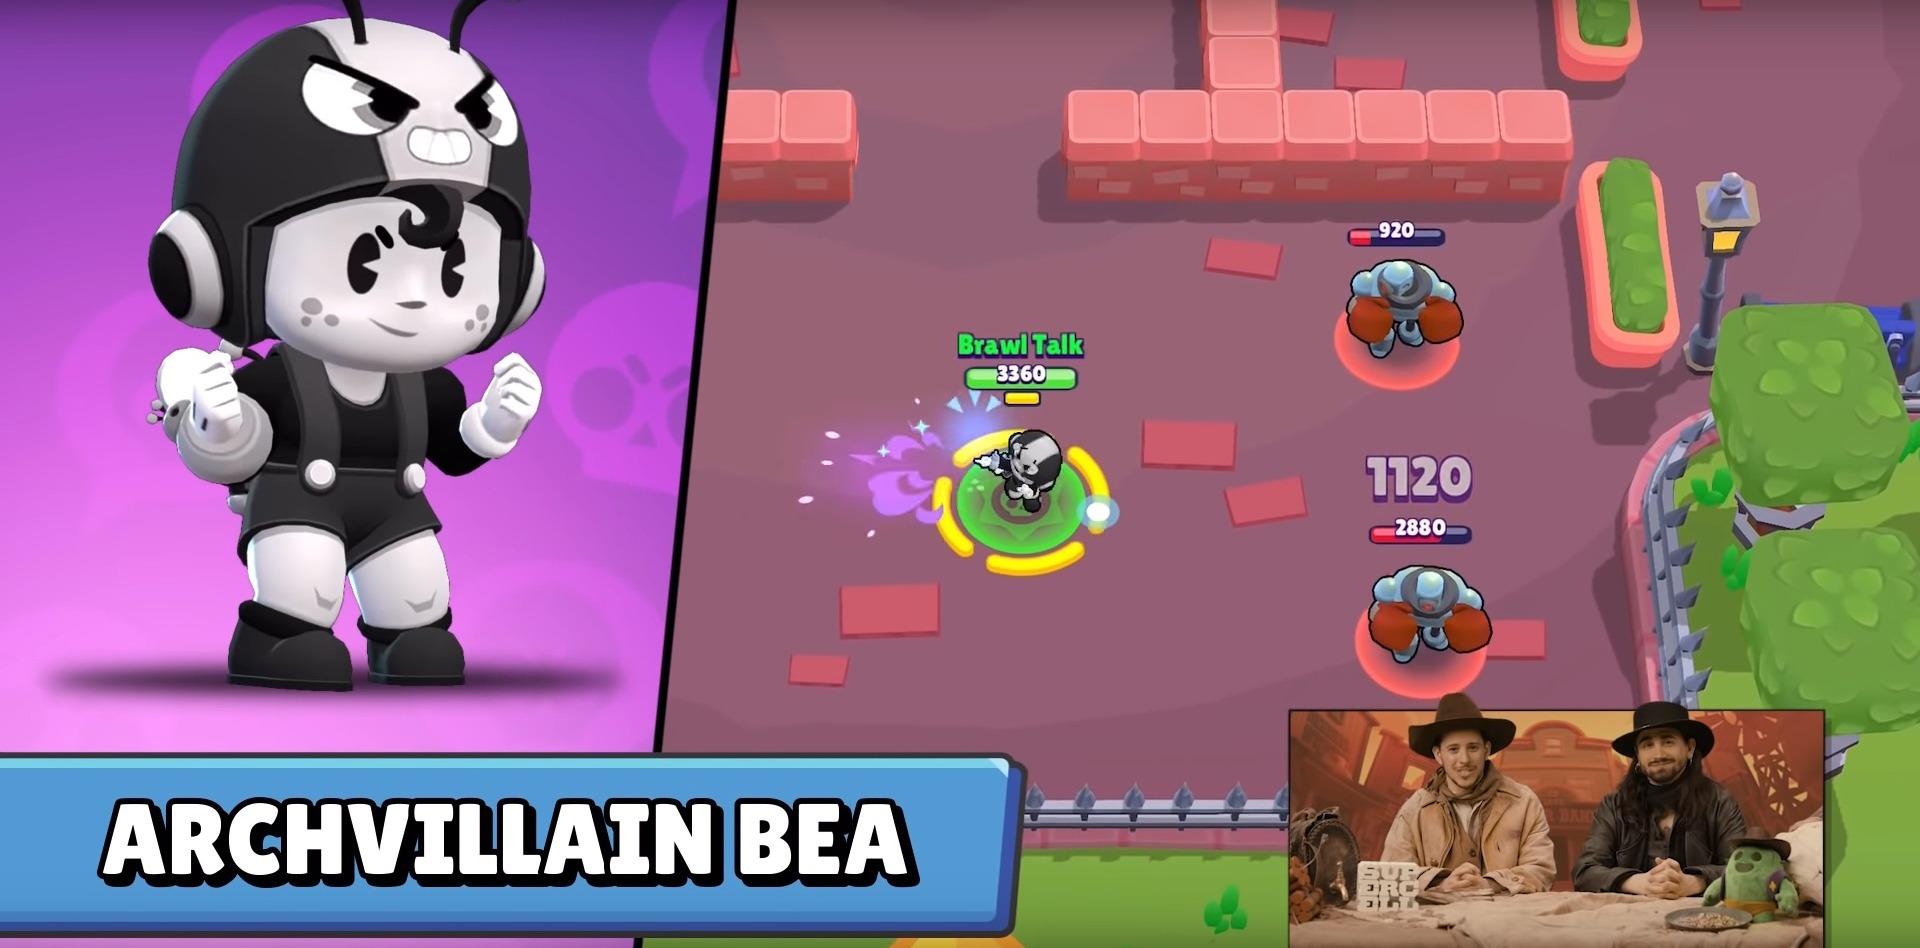 archvillain-bea-brawl